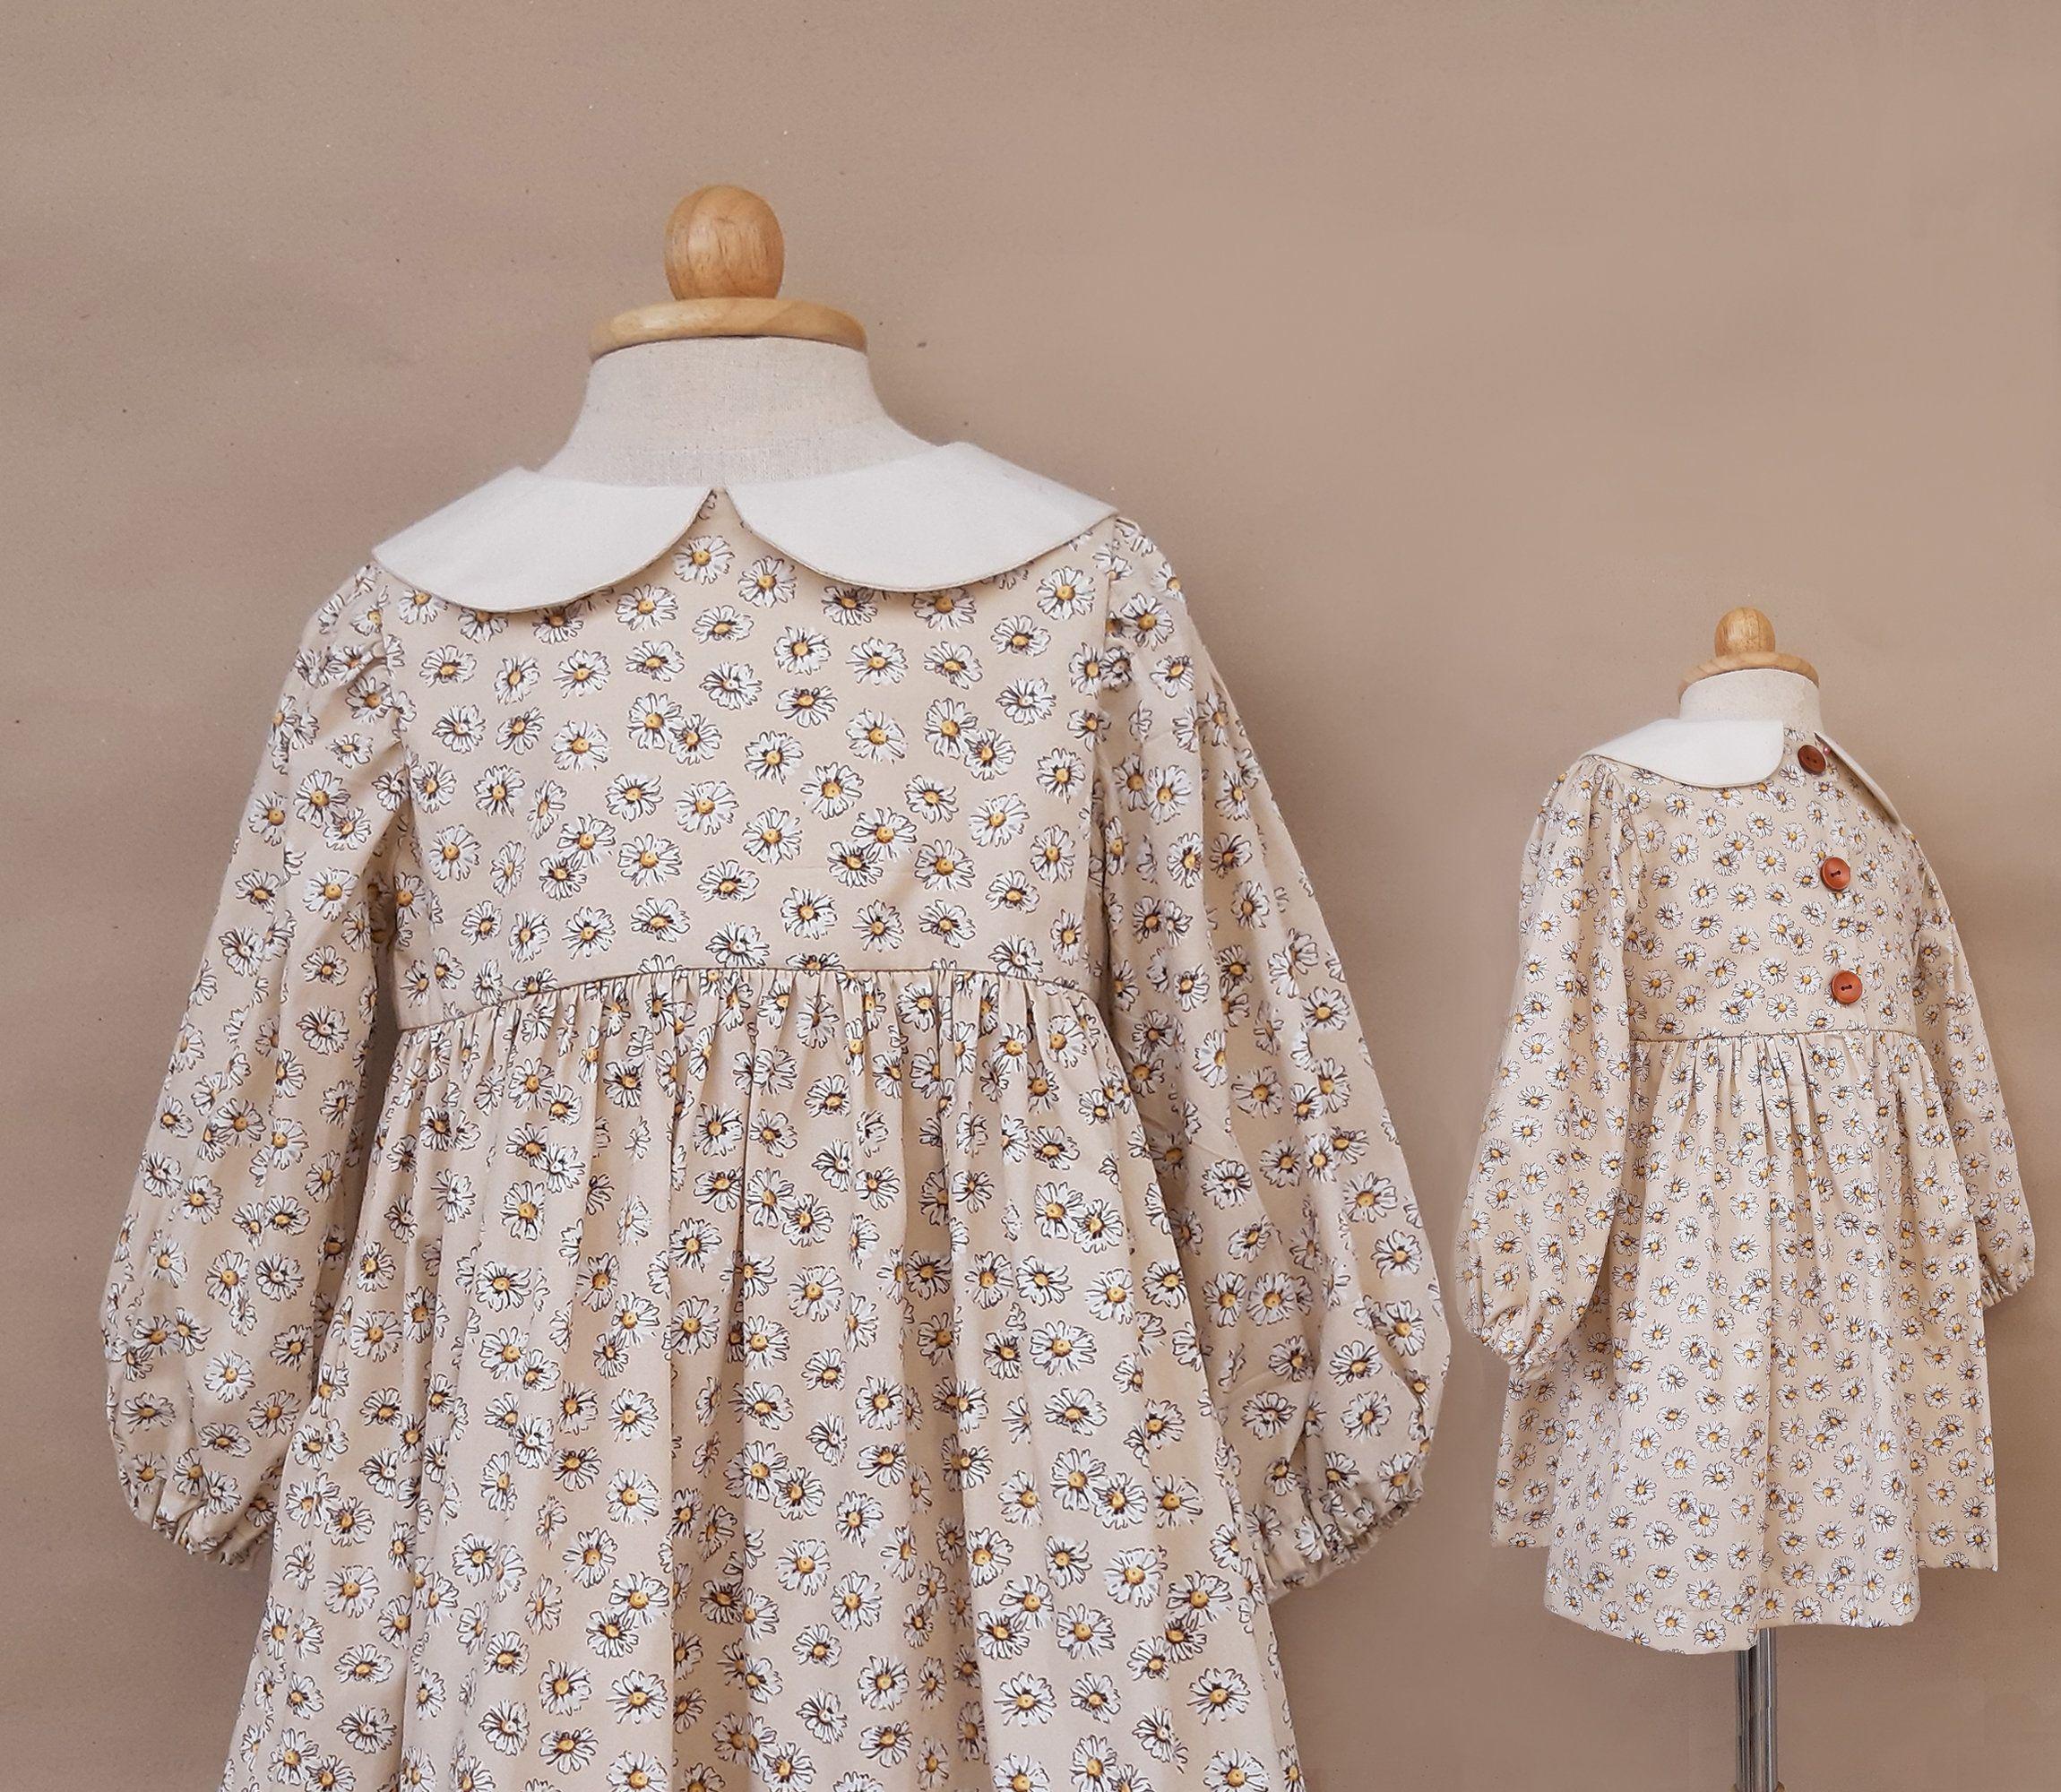 Vintage Girl Dress Long Sleeve Peter Pan Collar Brown Daisy Etsy Vintage Girls Dresses Toddler Girl Dresses Girls Dress Outfits [ 2000 x 2300 Pixel ]